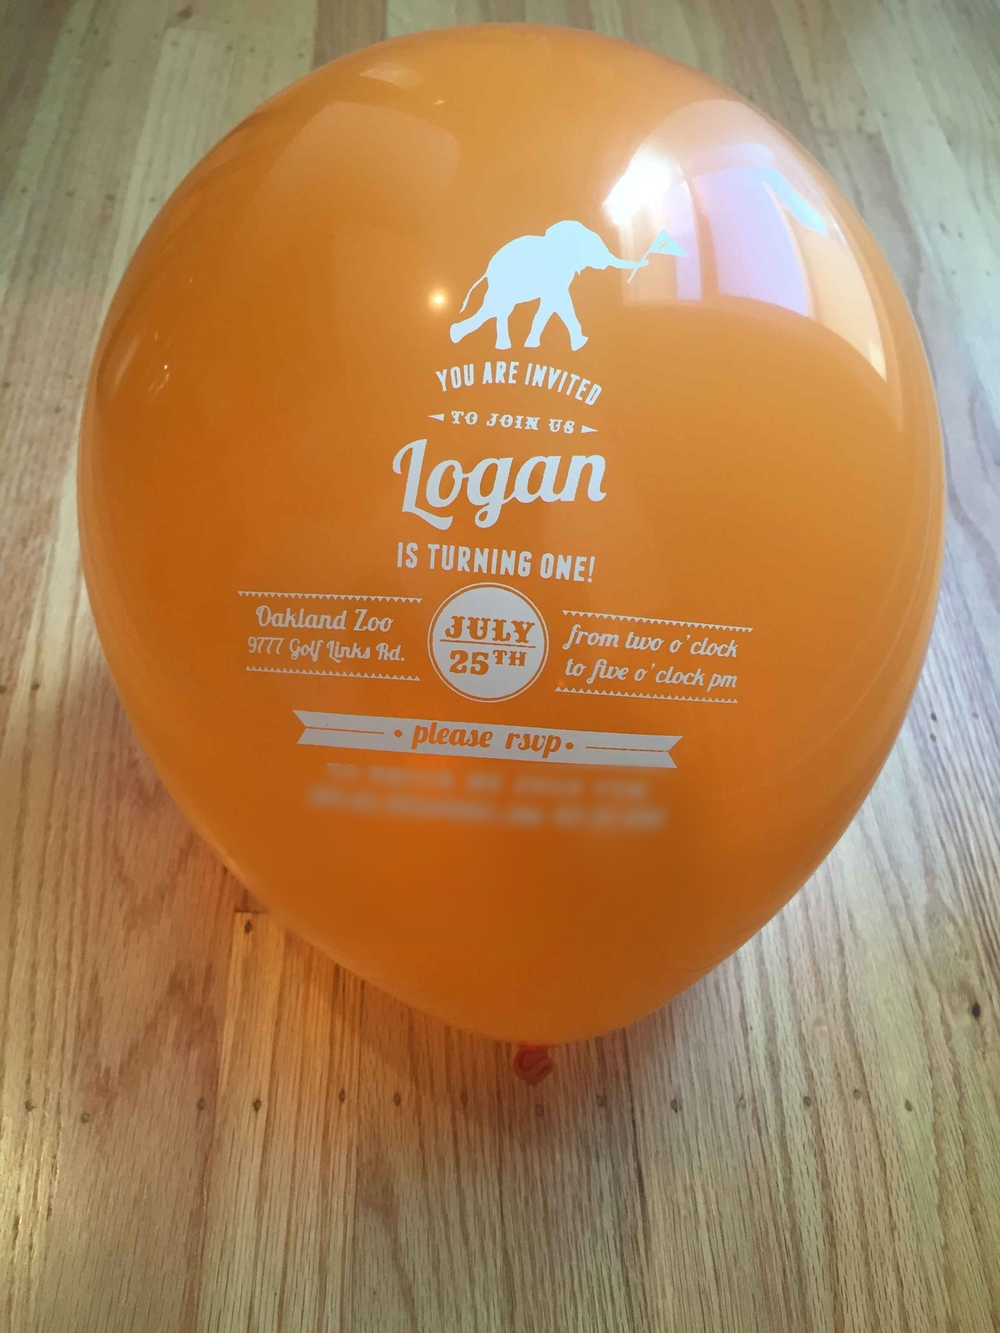 "img src=""httpwww.theparkwayevents.jpg"" alt=""San Francisco Bay Area Kids Birthday Party Event Planner Balloon Invitation"".jpg"